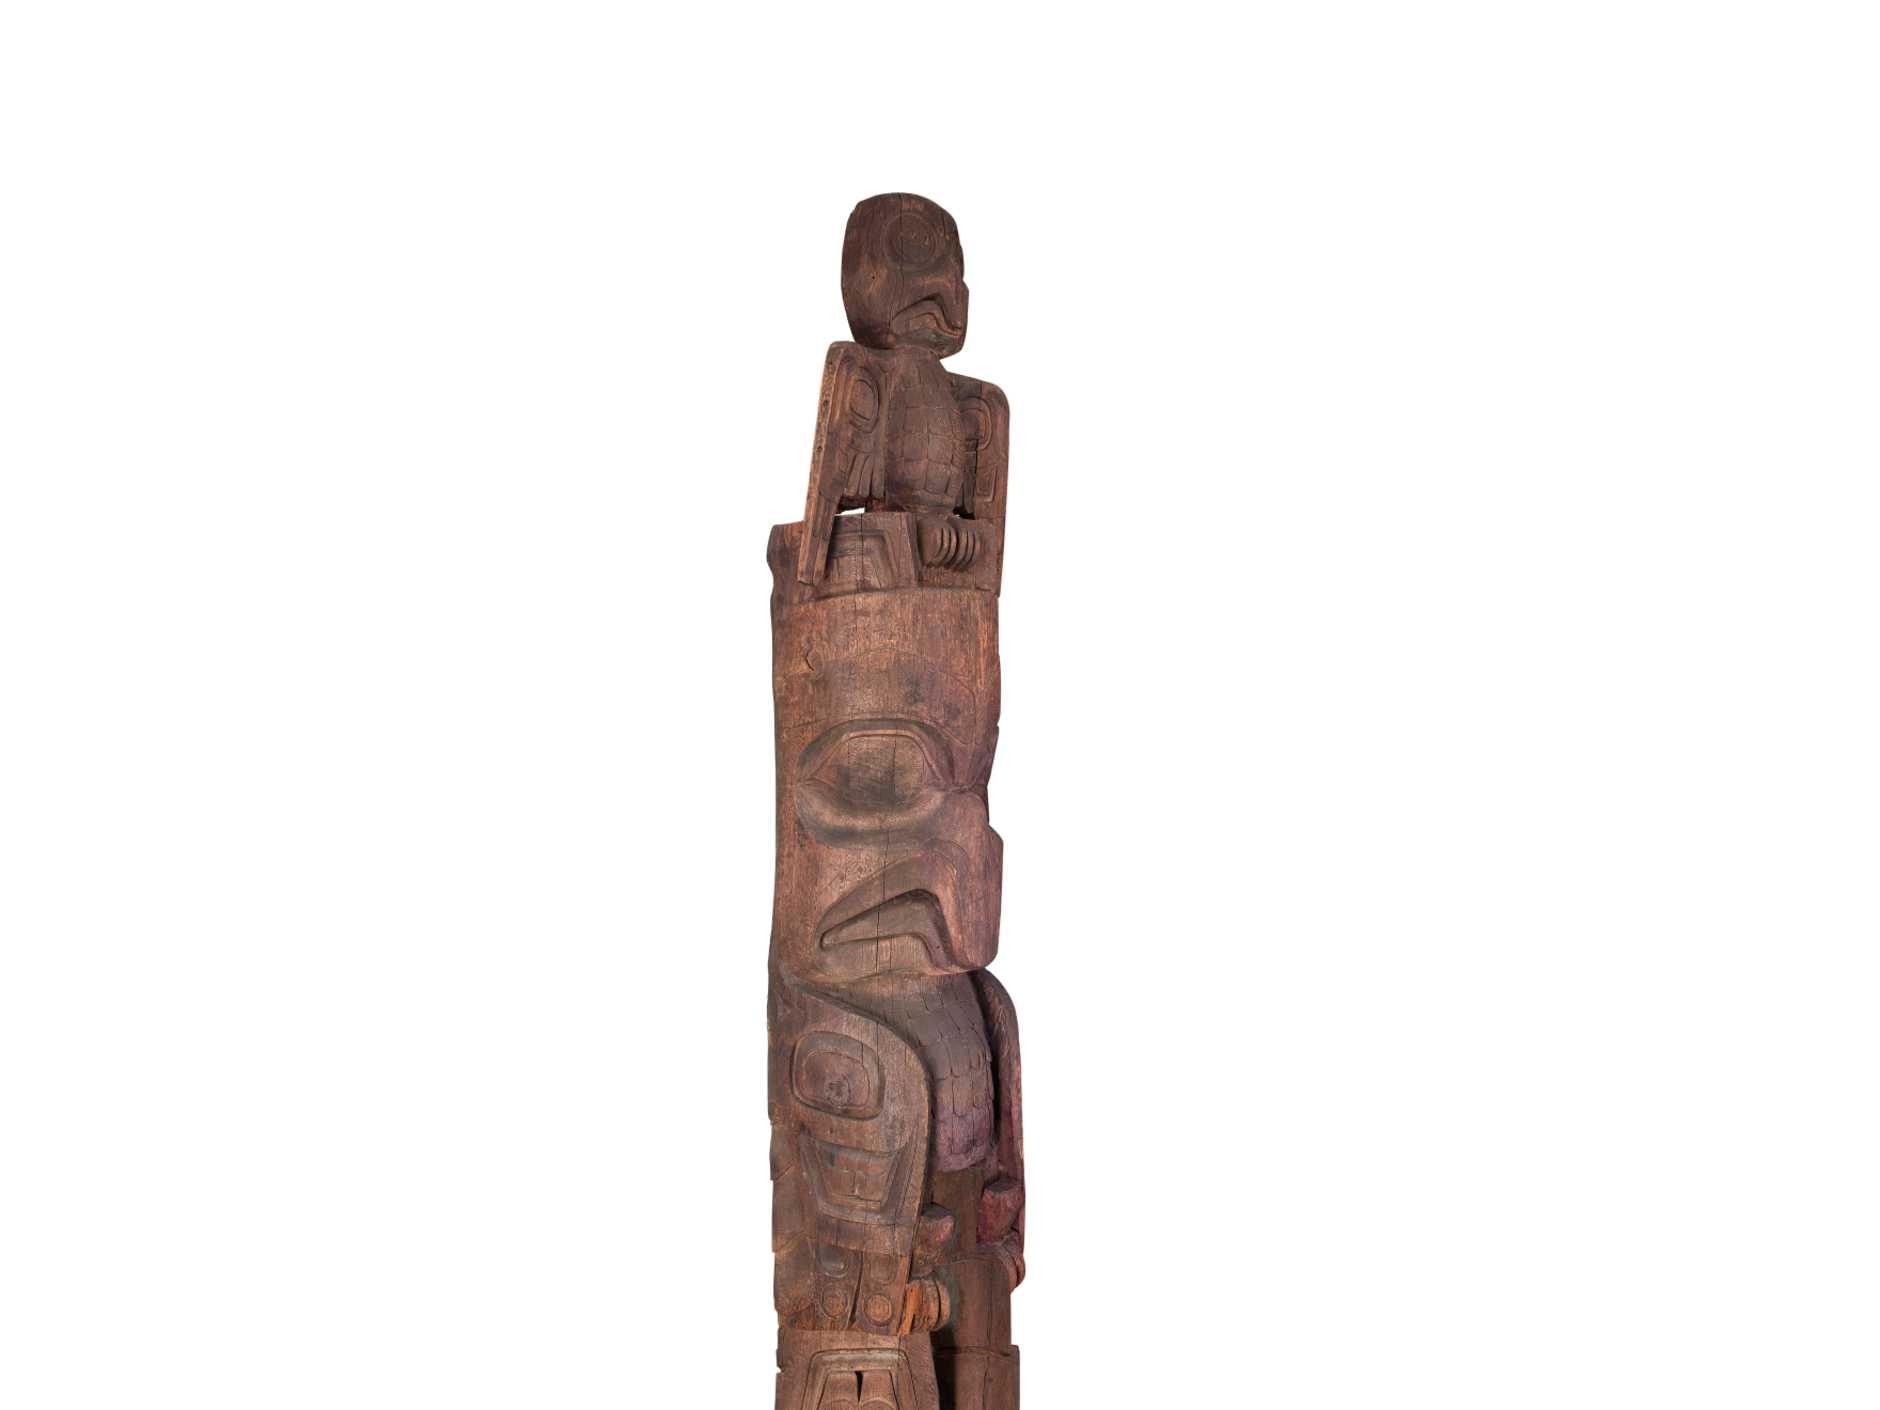 Eagle and bear totem by haida artist gryn white